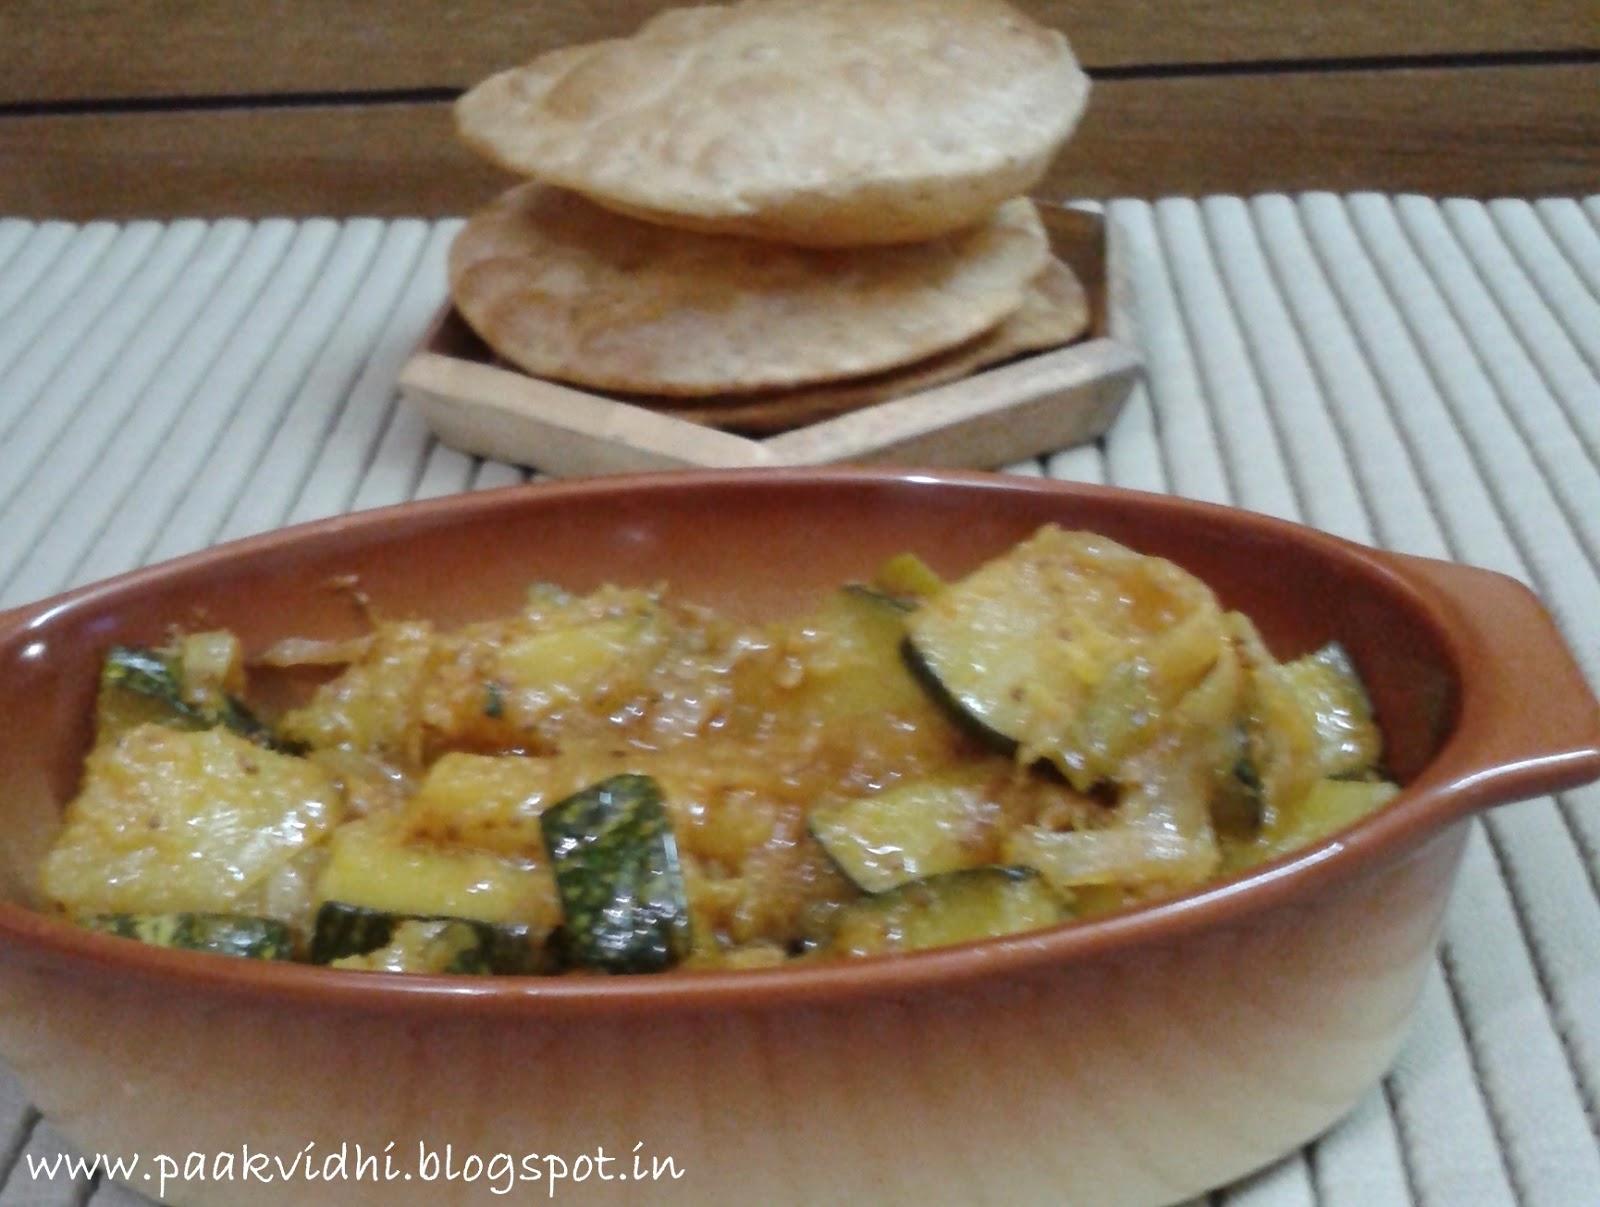 http://paakvidhi.blogspot.in/2014/08/petha-kaddu-ki-sabzi-recipe.html